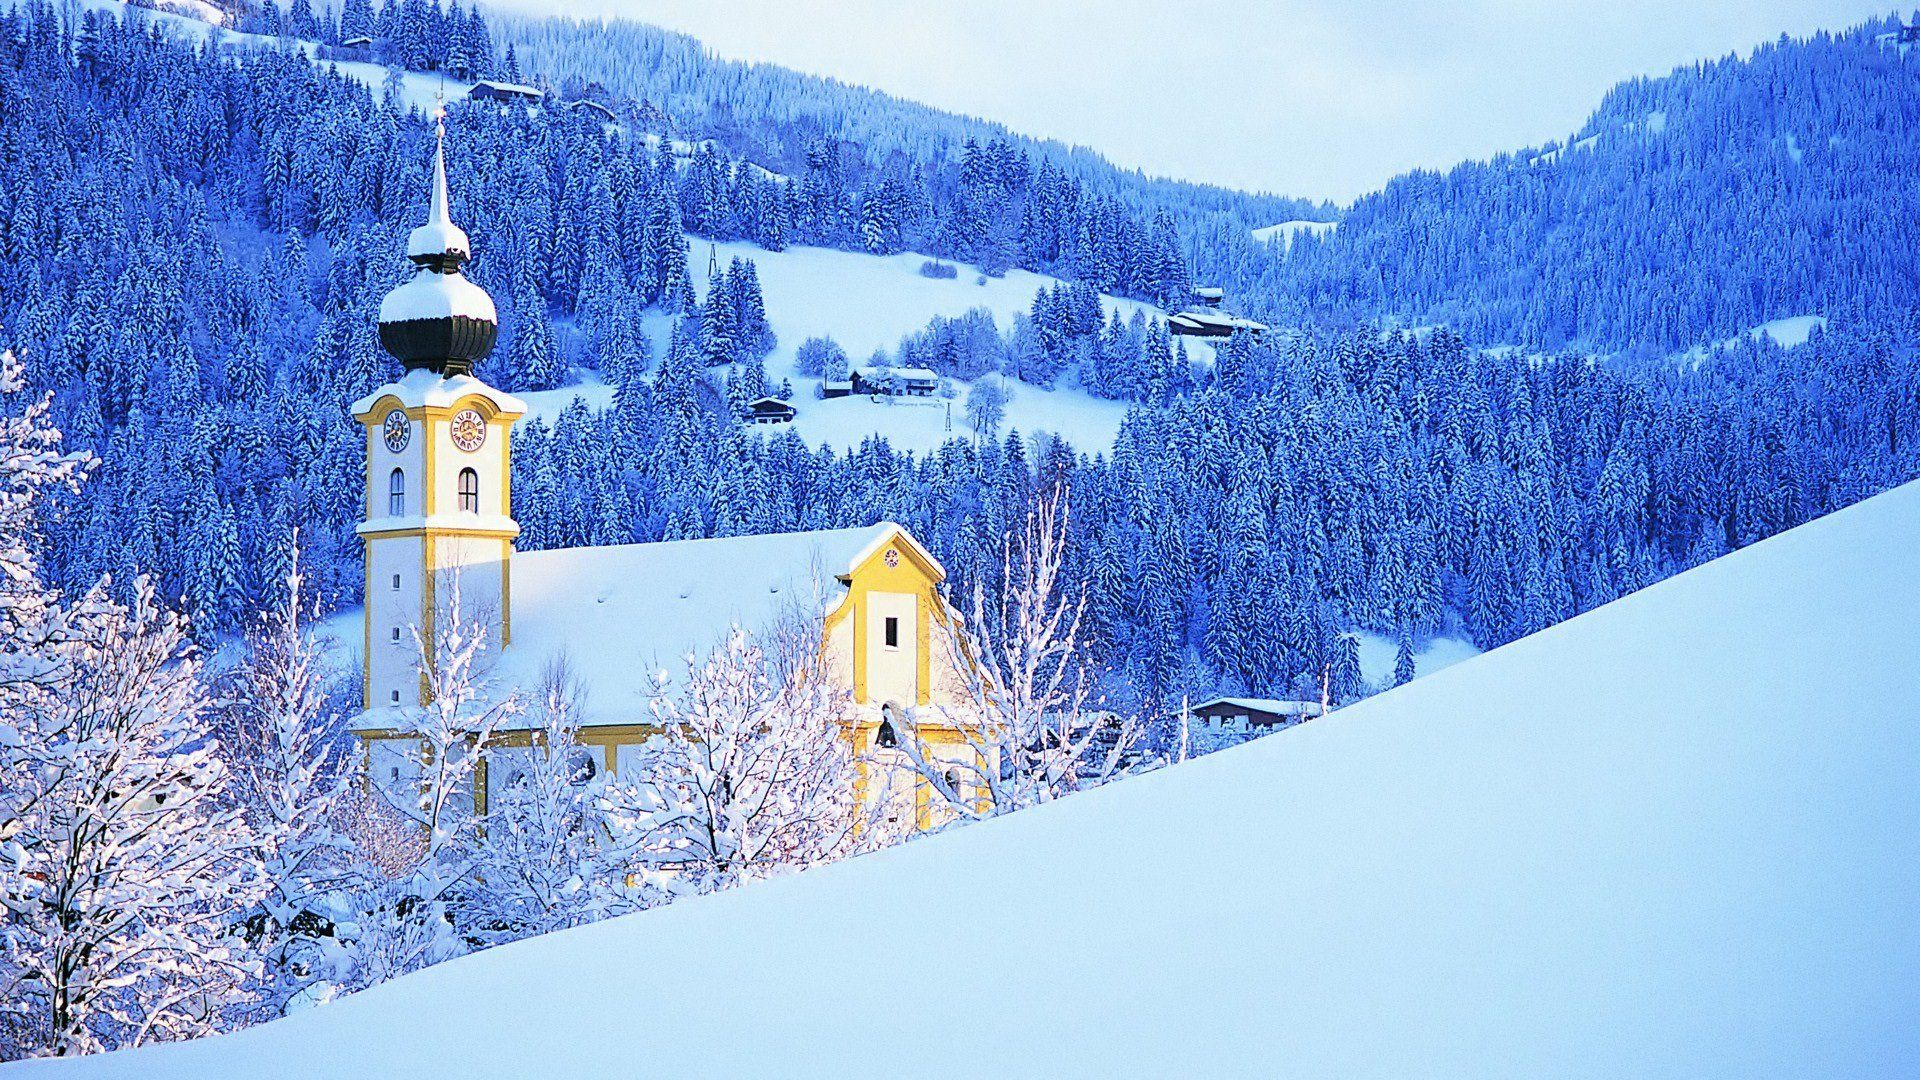 pin by kat karasinska on dream home | skiing, austrian ski resorts